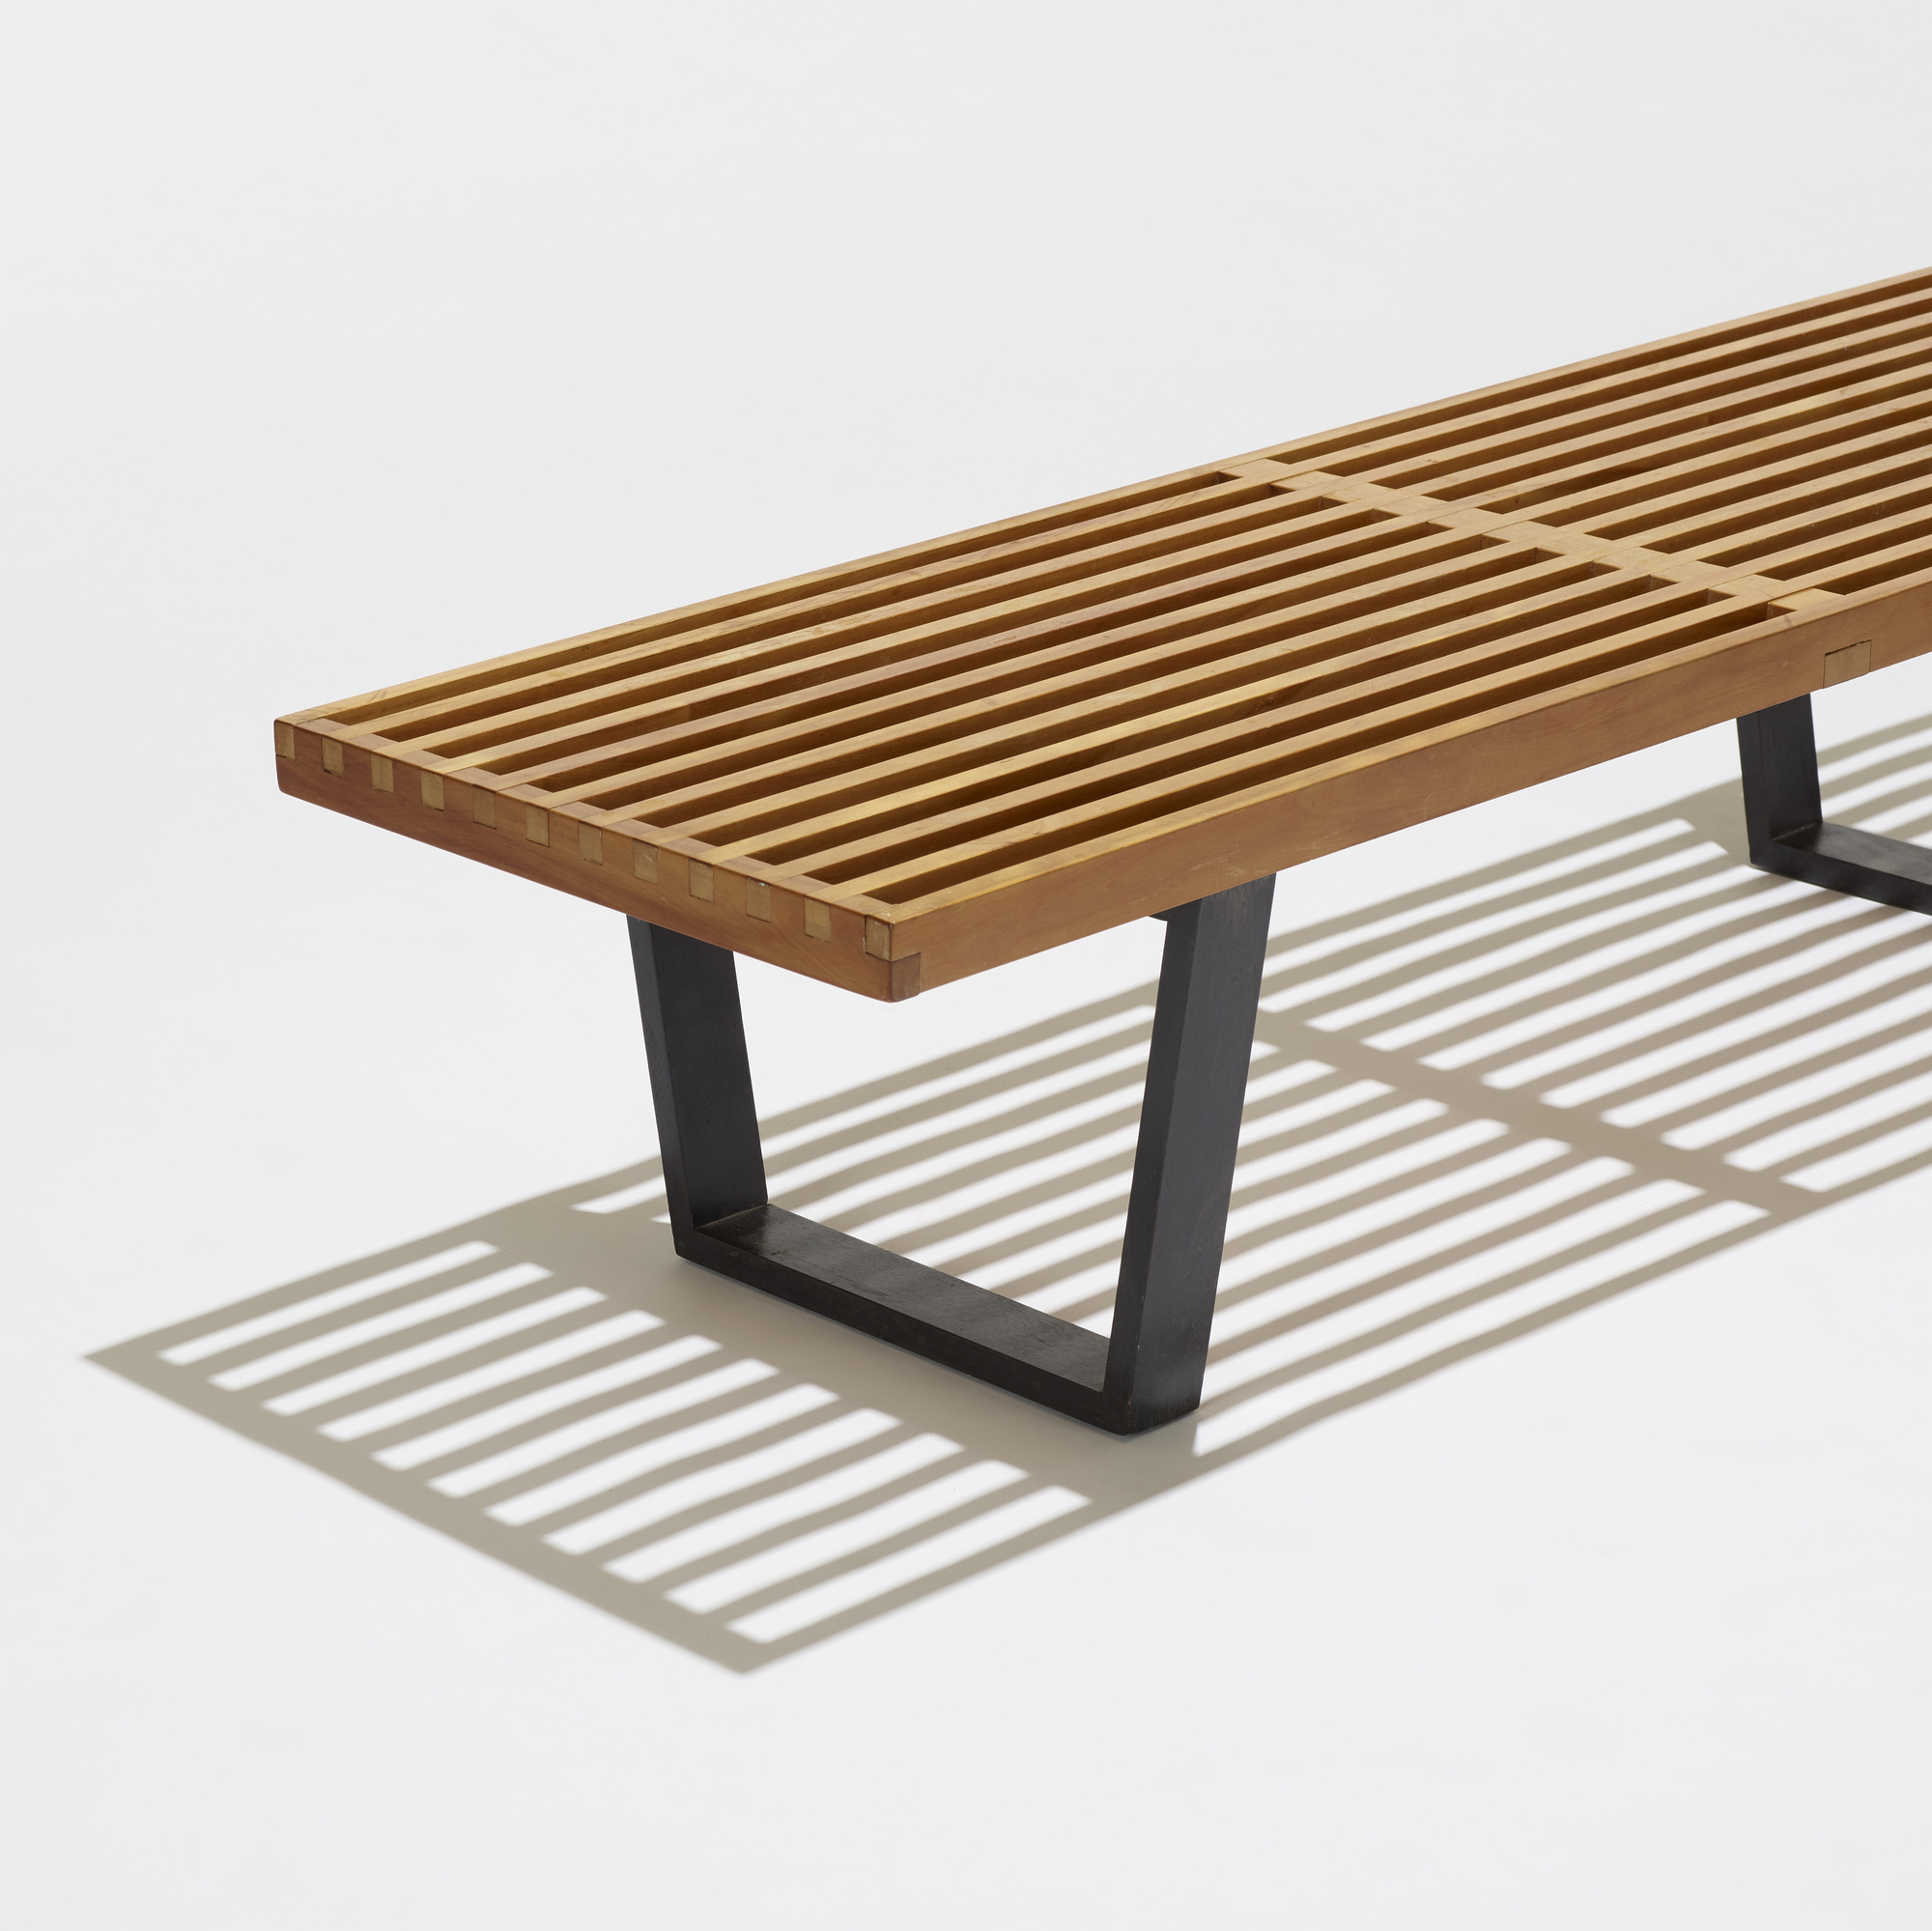 173 GEORGE NELSON & ASSOCIATES slat bench model 4690 American